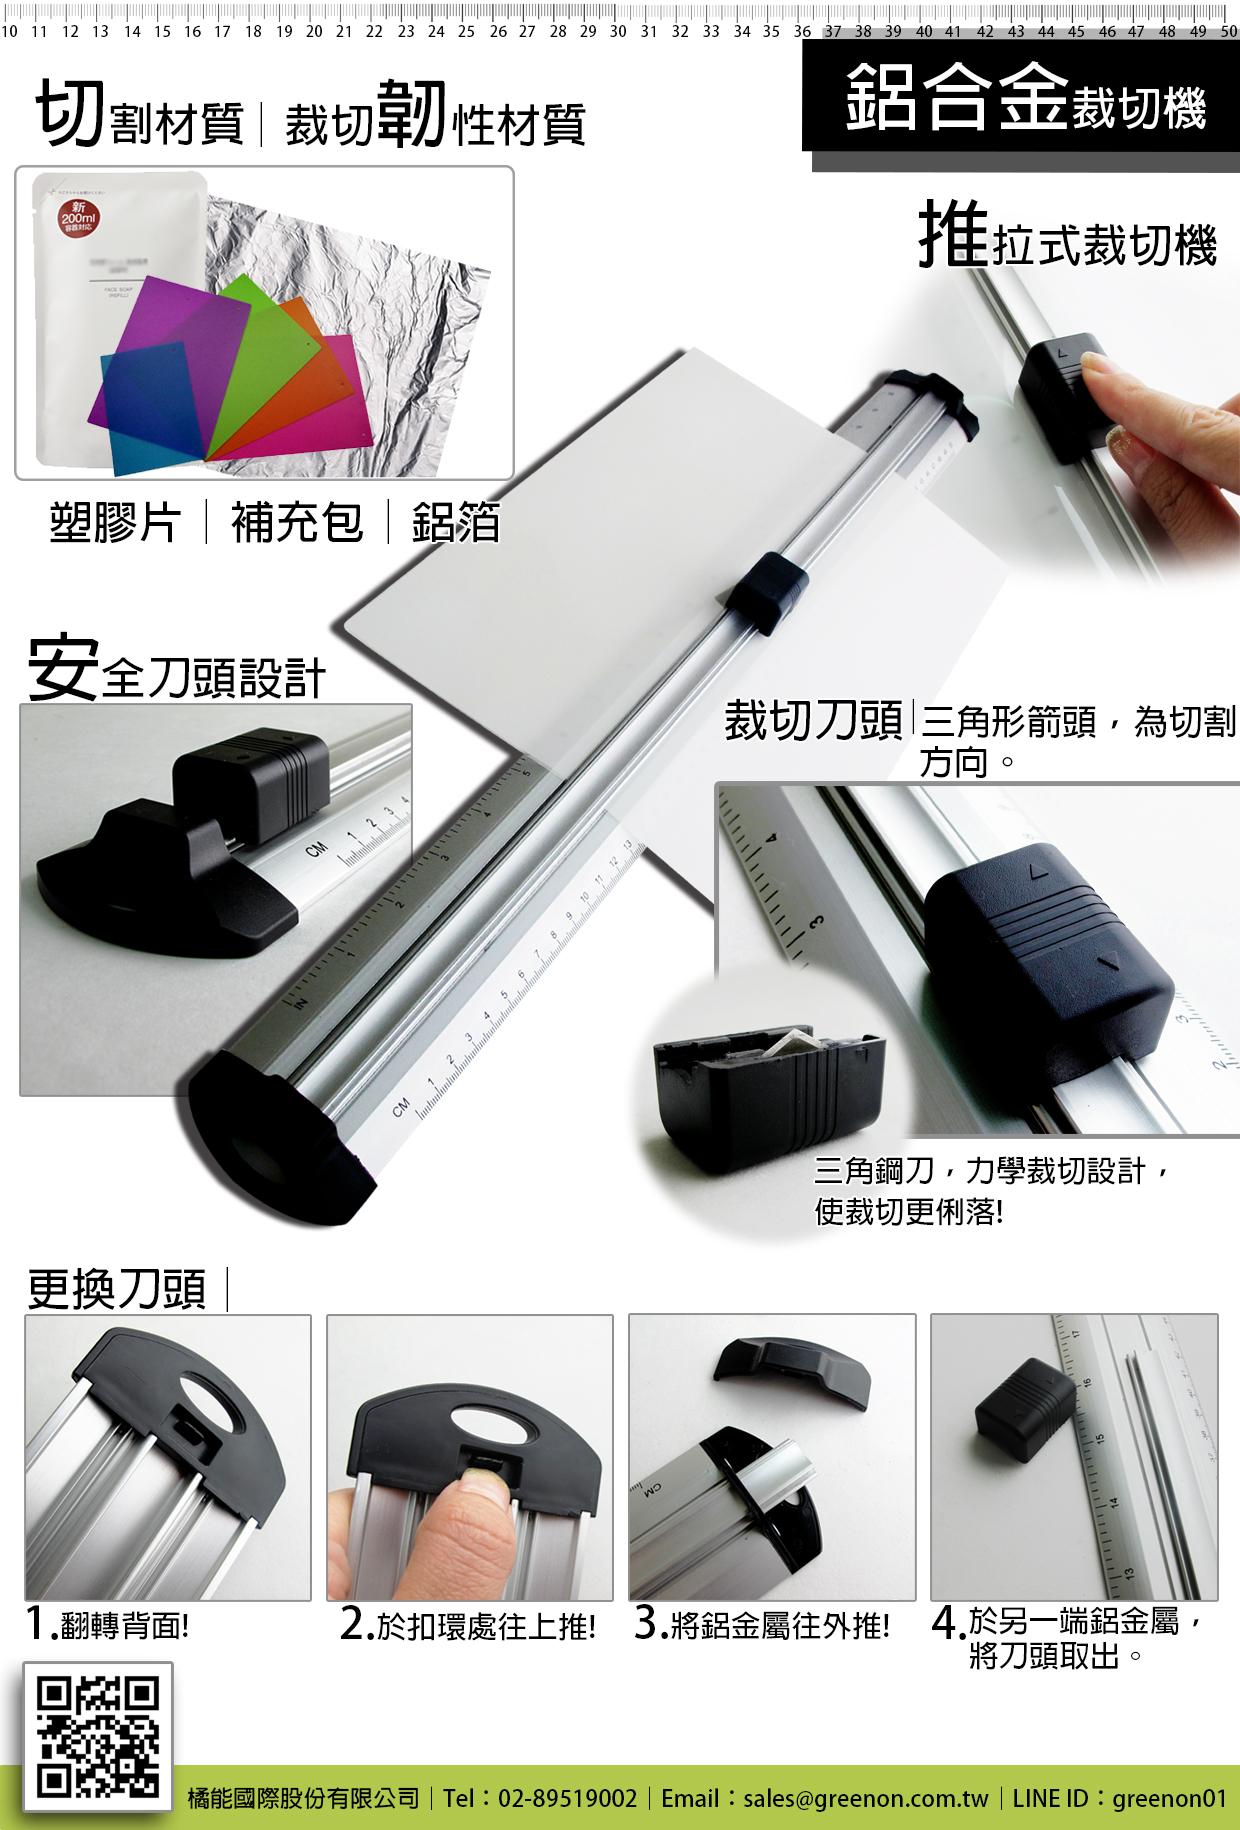 GREENON-Meteor-鋁合金裁切機,三角鋼刀,可裁切韌性材質